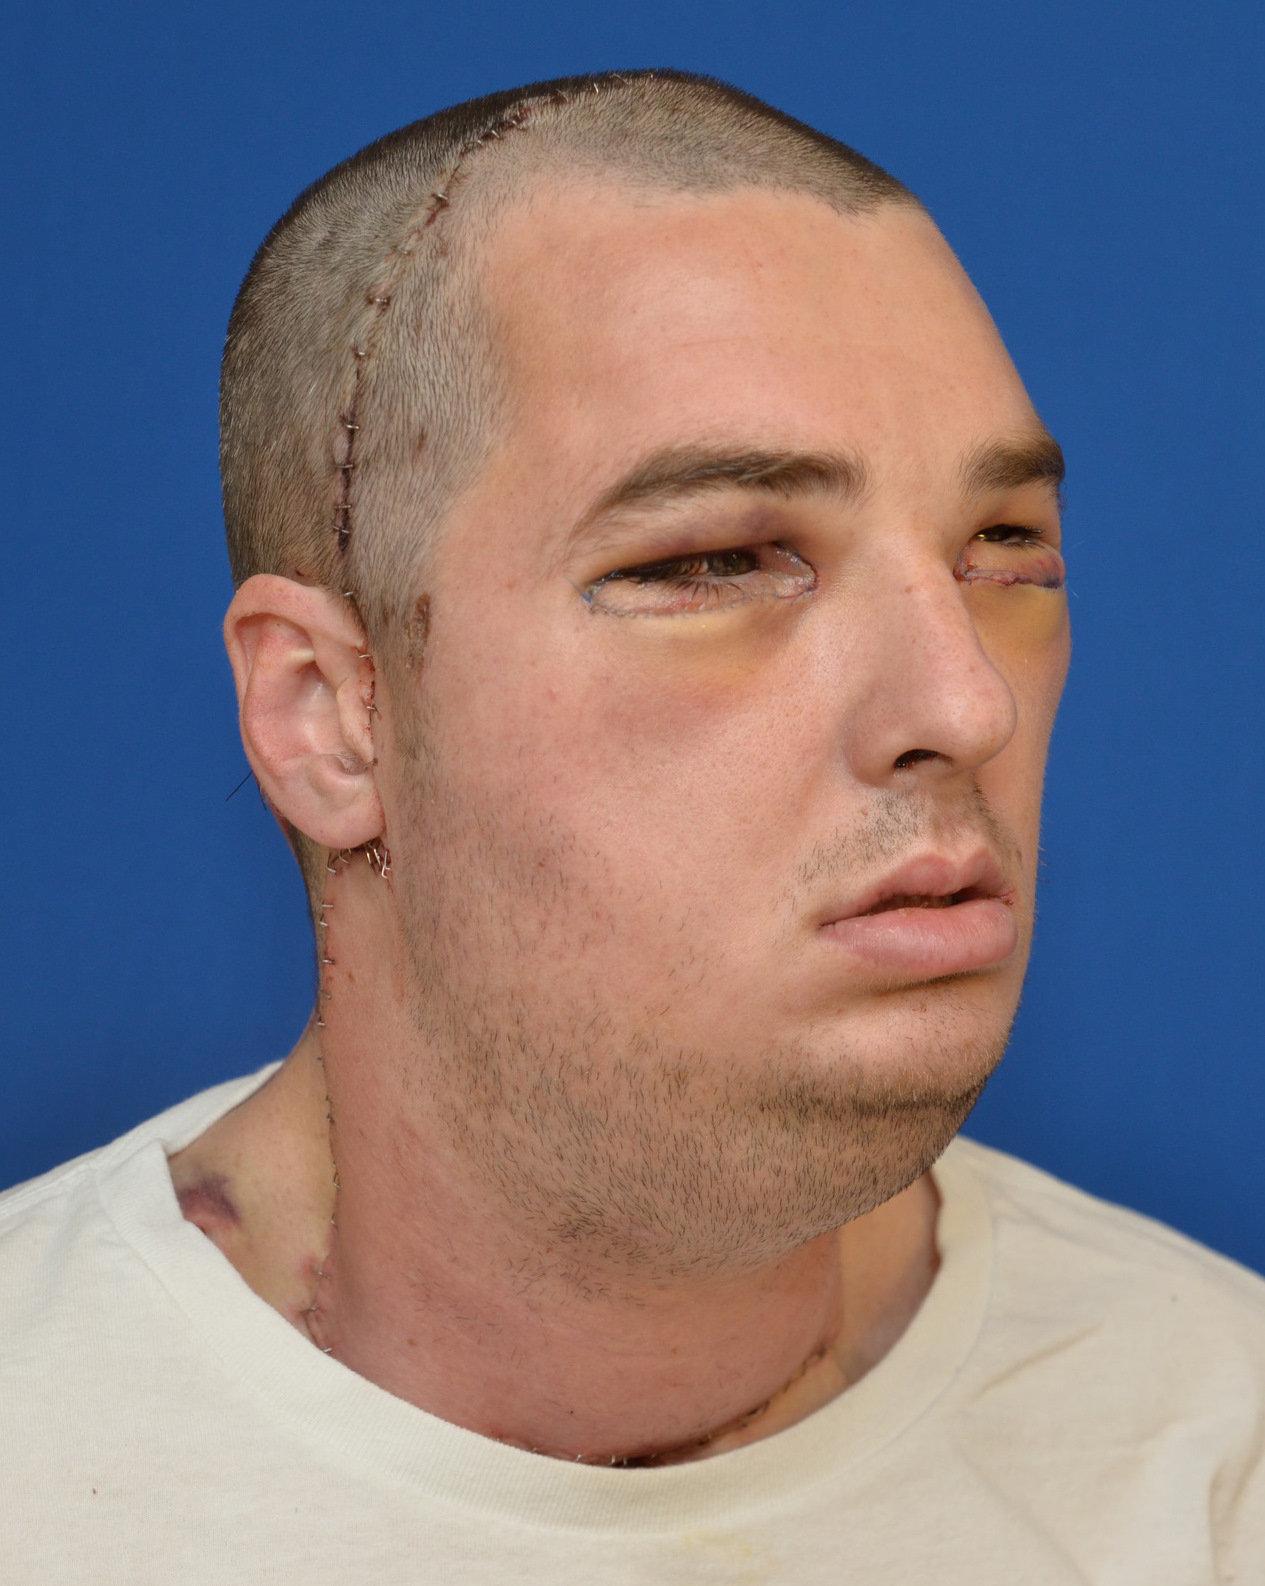 Complete facial transplant